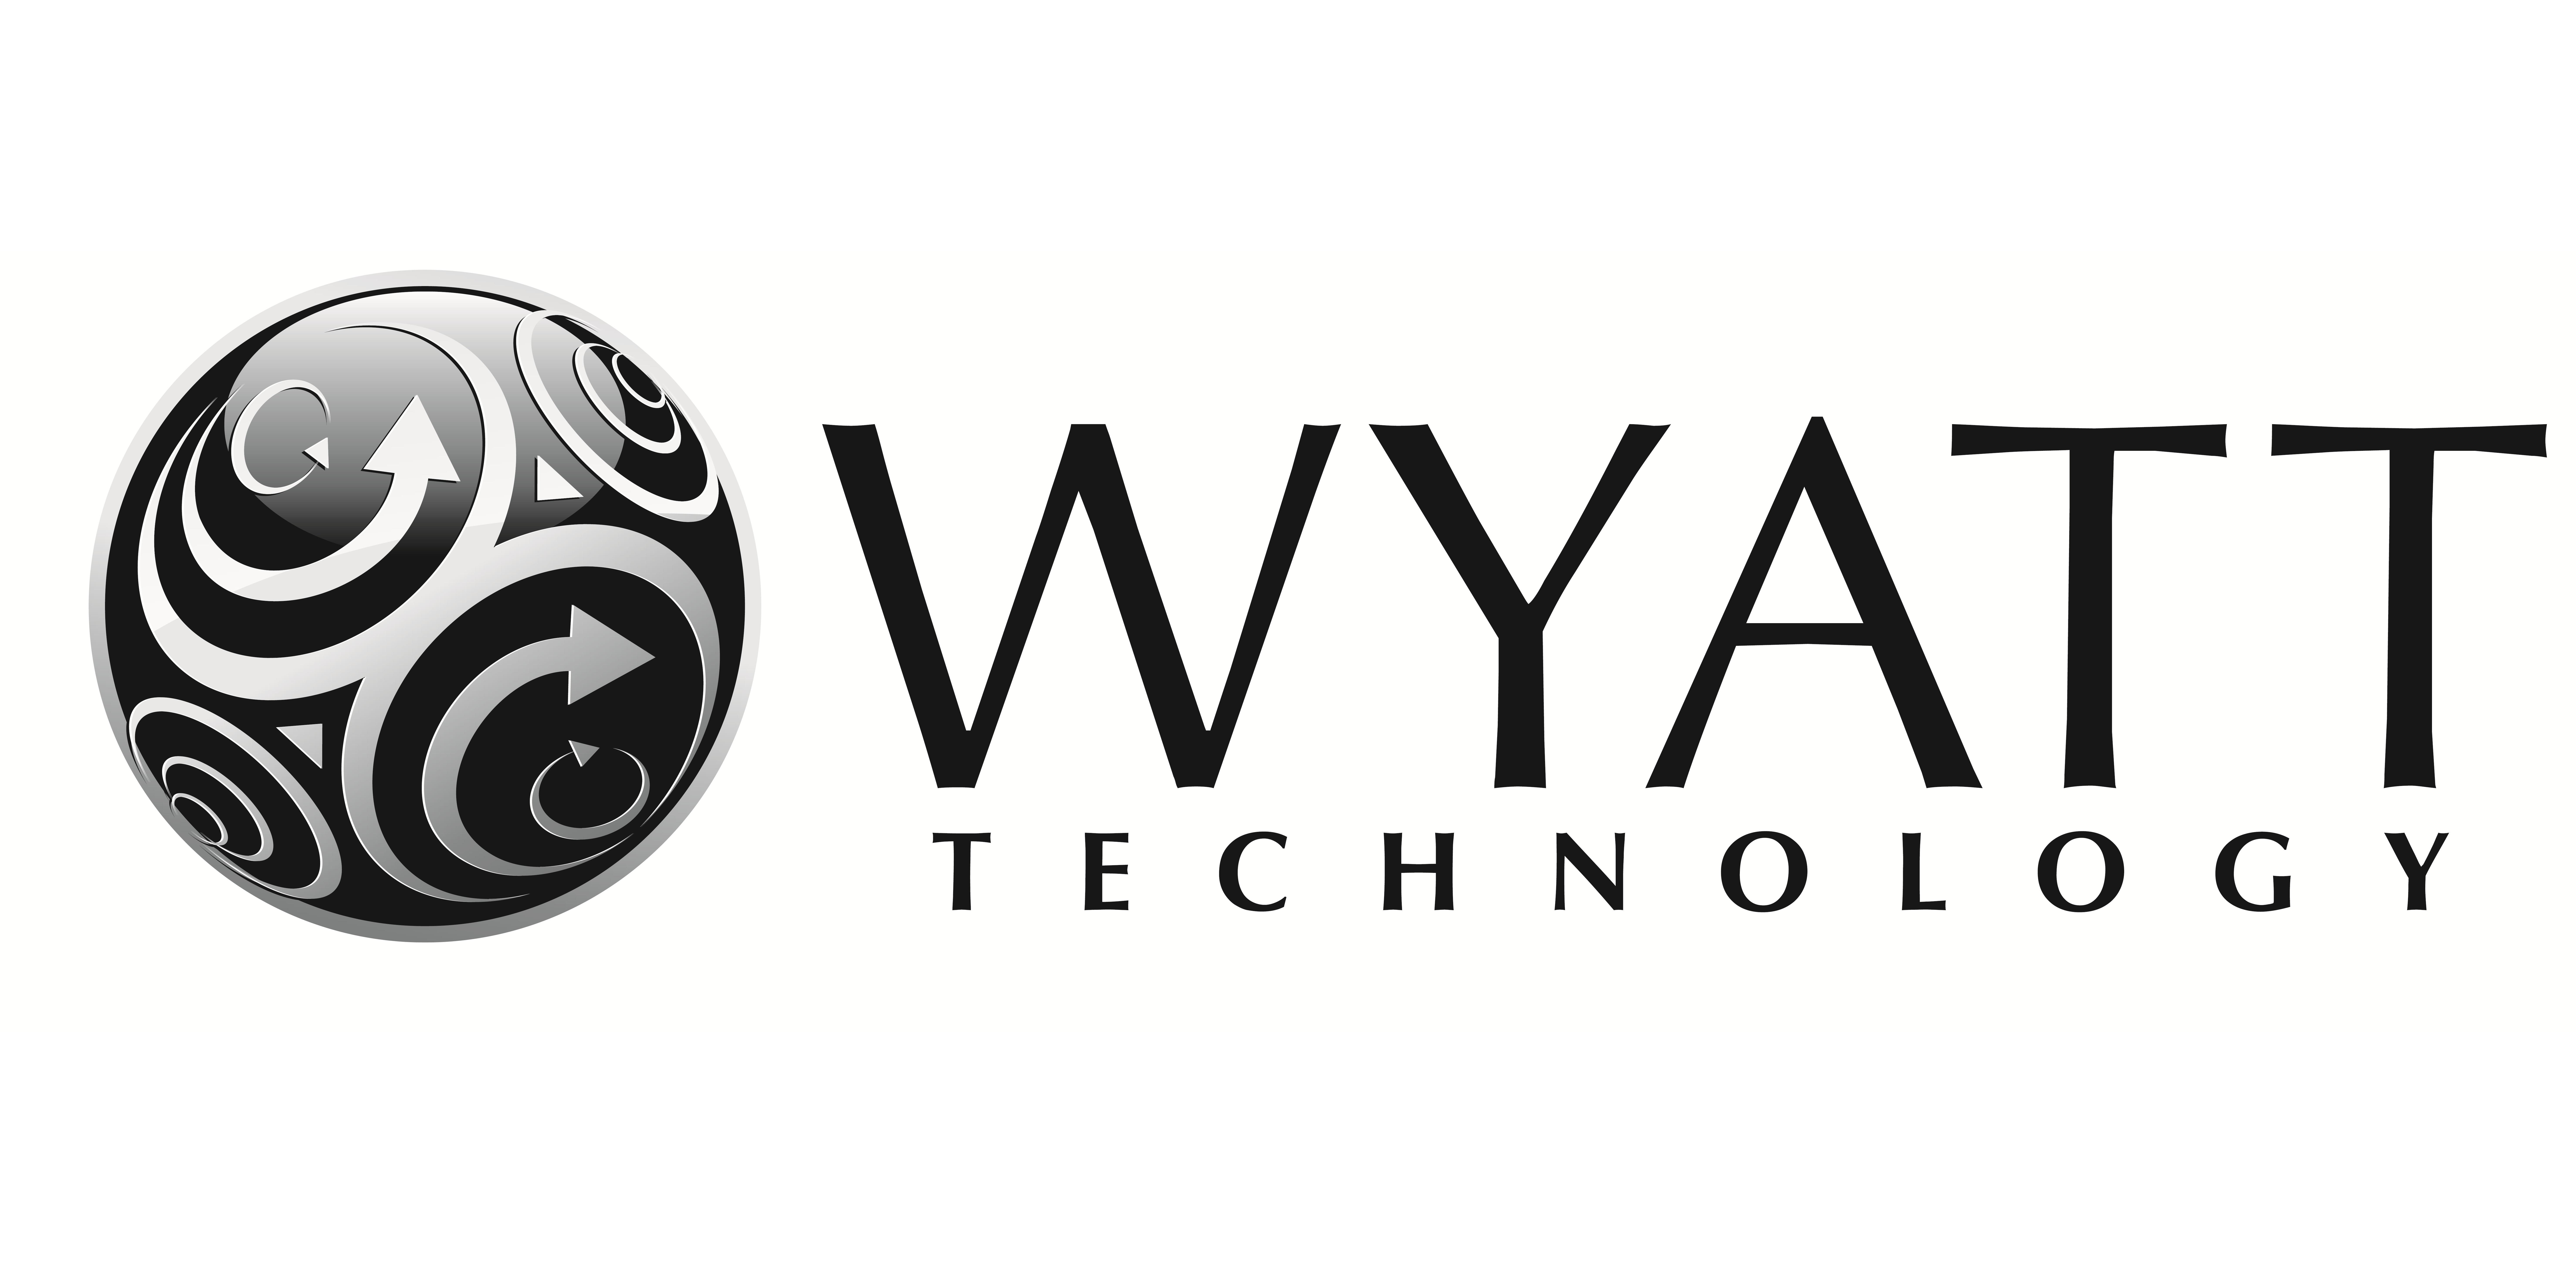 Wyatt_New_Logo_and_Company_Name_Large_012.jpg